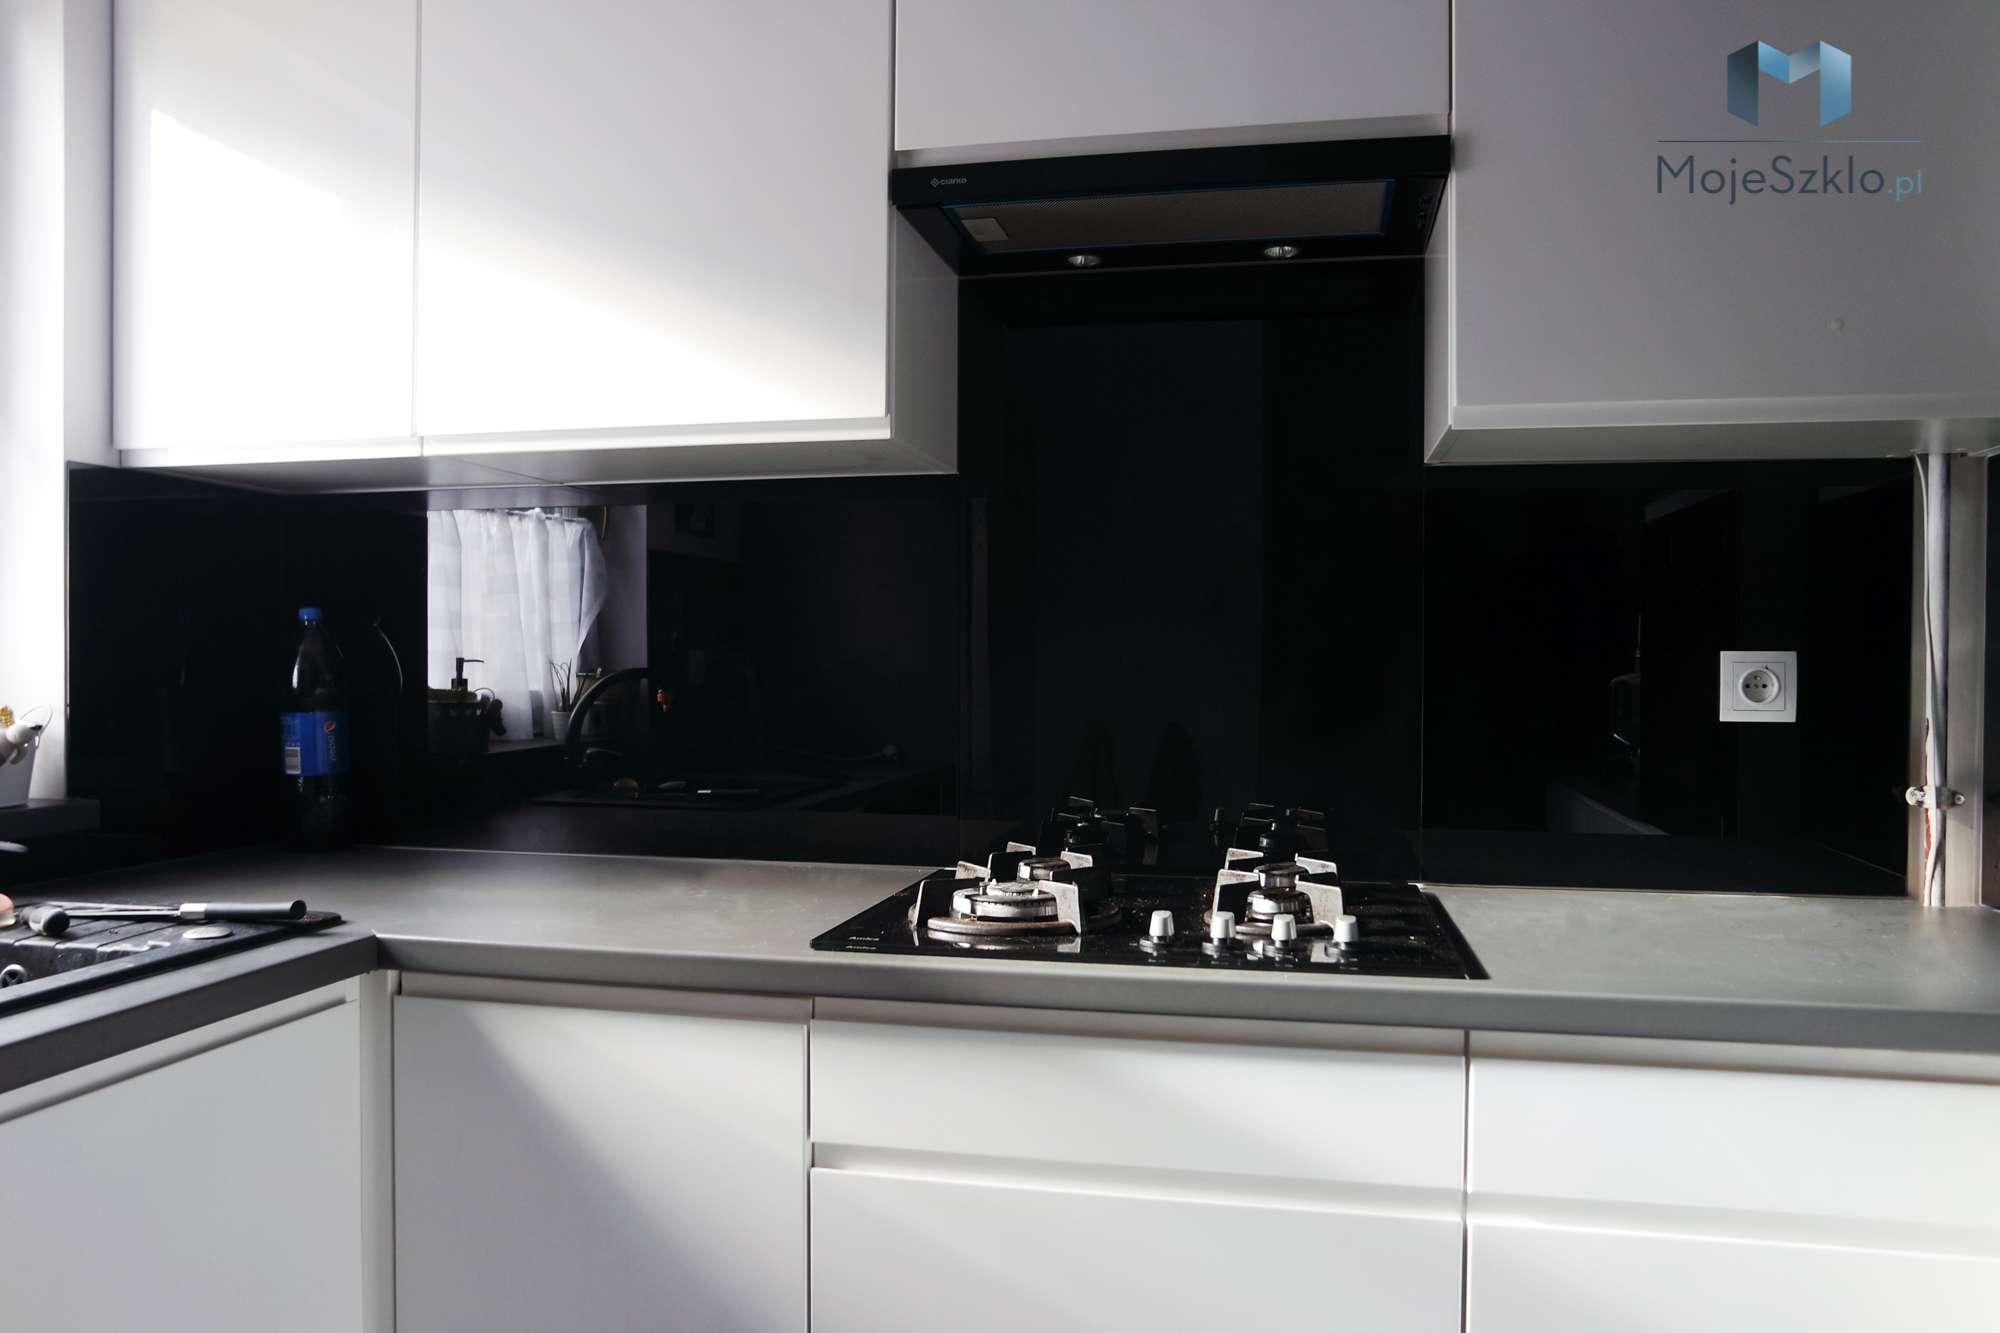 Lacobel Czarny Krakow - Lacobel czarny - panele szklane jak lustro